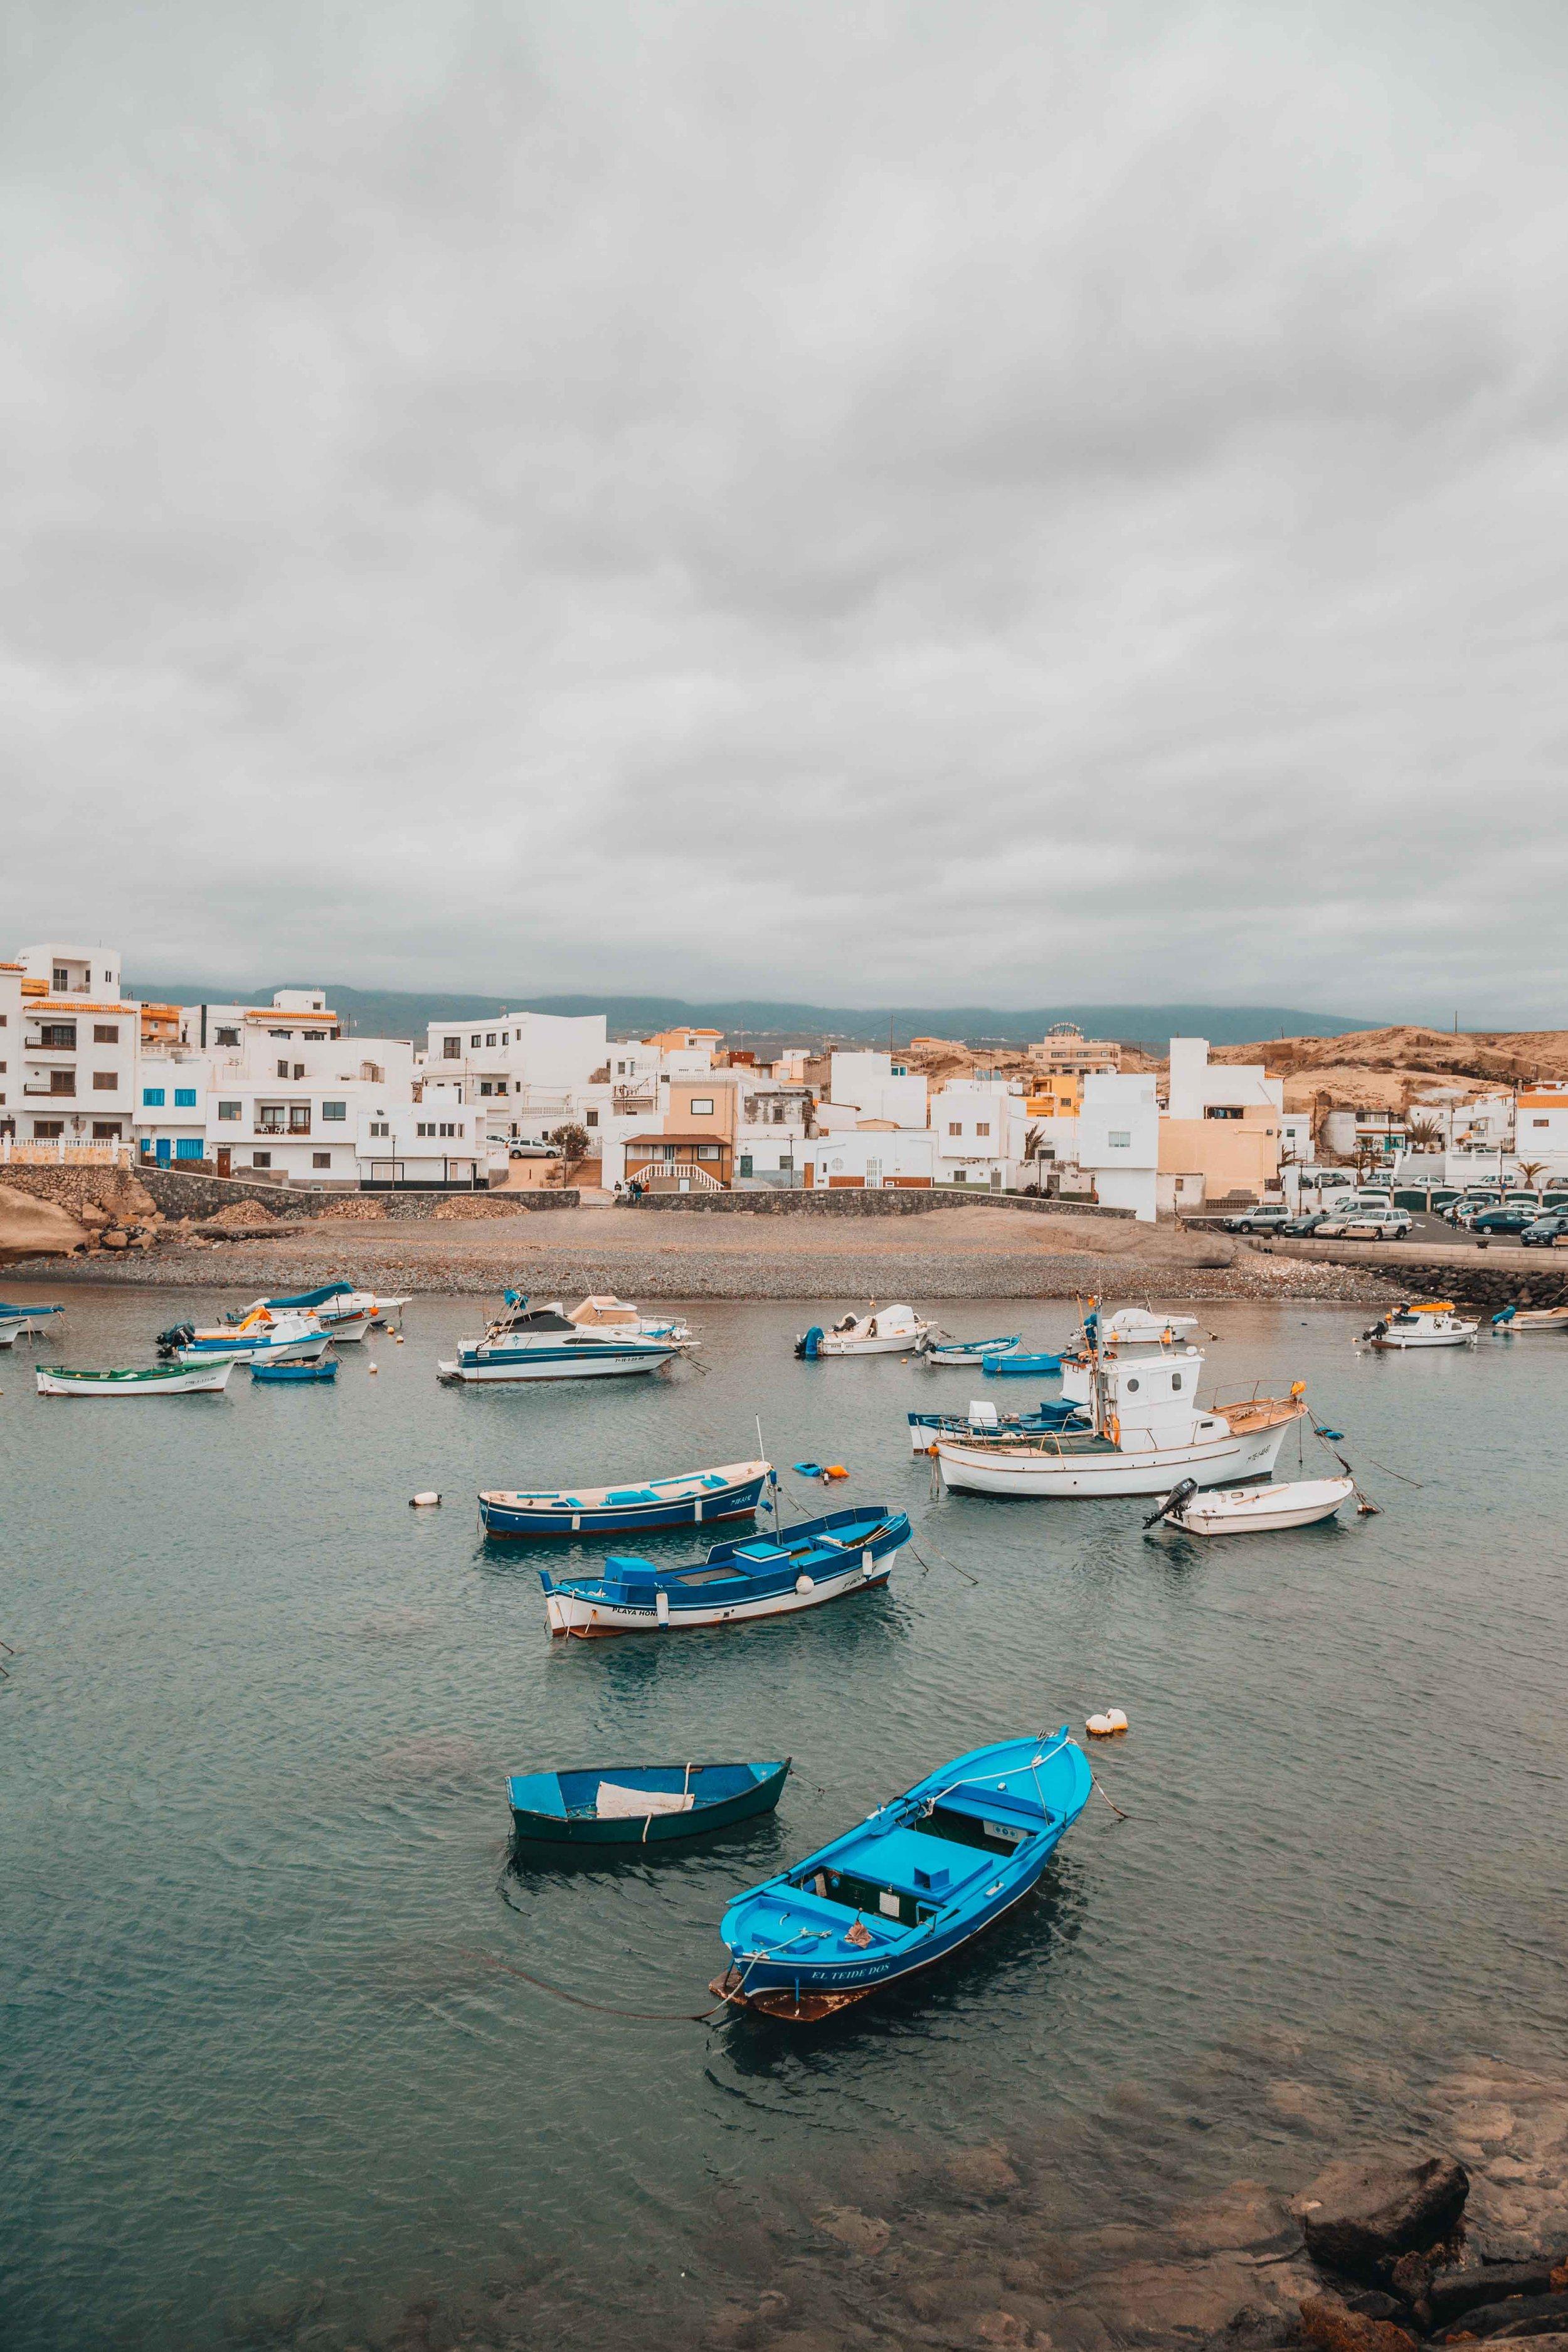 Tenerife-1.jpg